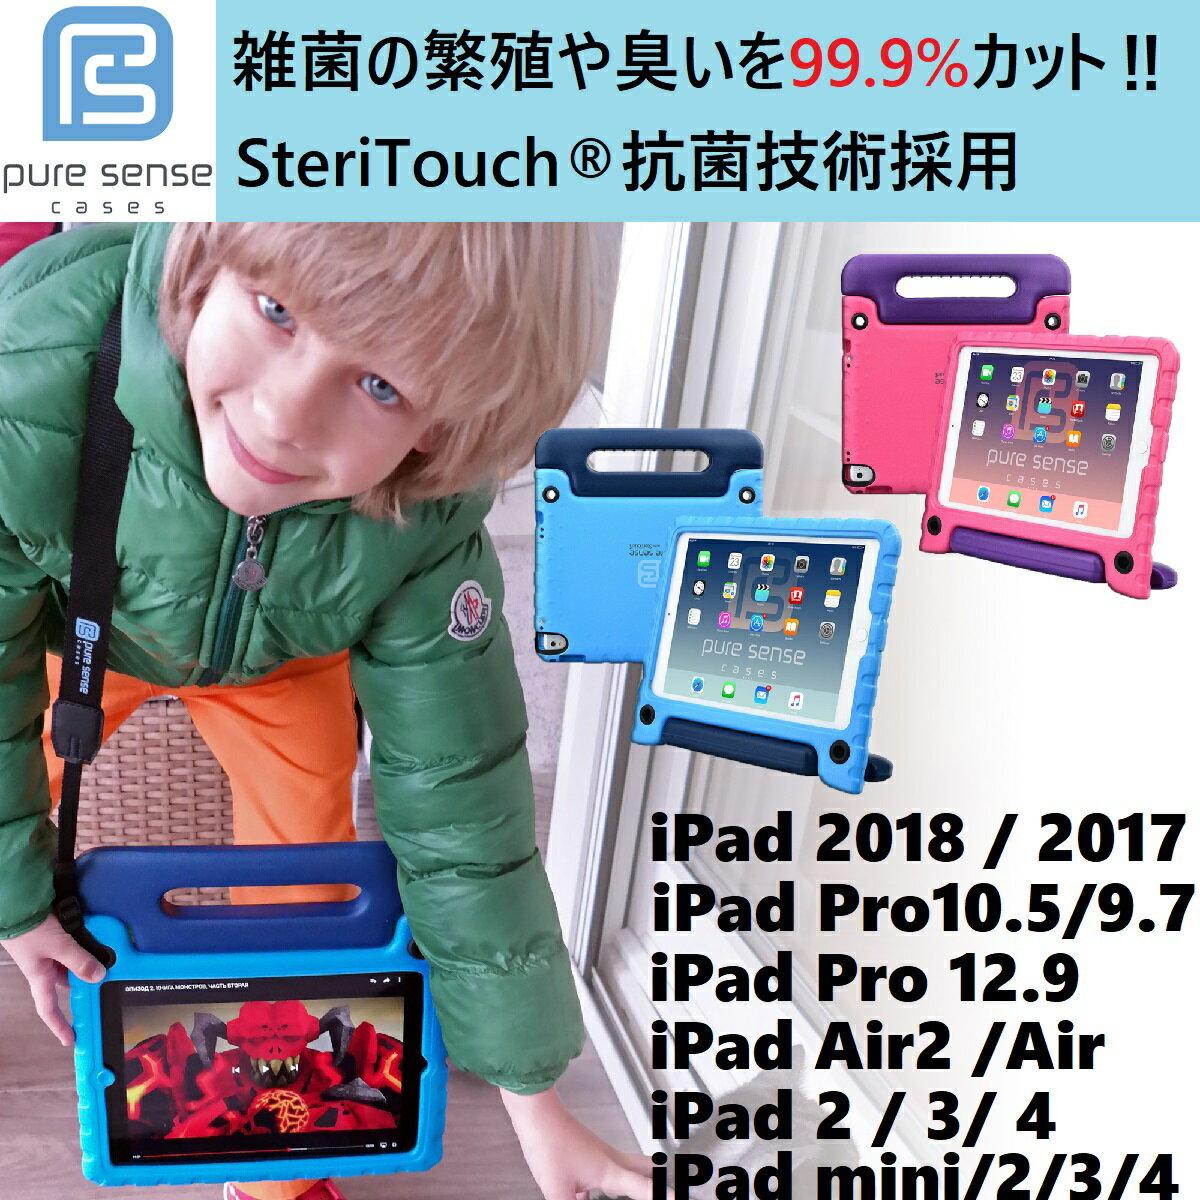 ipad 2017 ケース ipad 2018 ipad6 6世代 9.7 ショルダー pro 10.5 耐衝撃 a1822 a1823 ipad5 air2 pro 12.9 mini4 mini ipad4 ipad2 子供 かわいい 第5世代 子供用 おしゃれ ハンドル キッズ カバー ストラップ 丈夫 頑丈 アイパッド Pure Sense ブランド Buddy